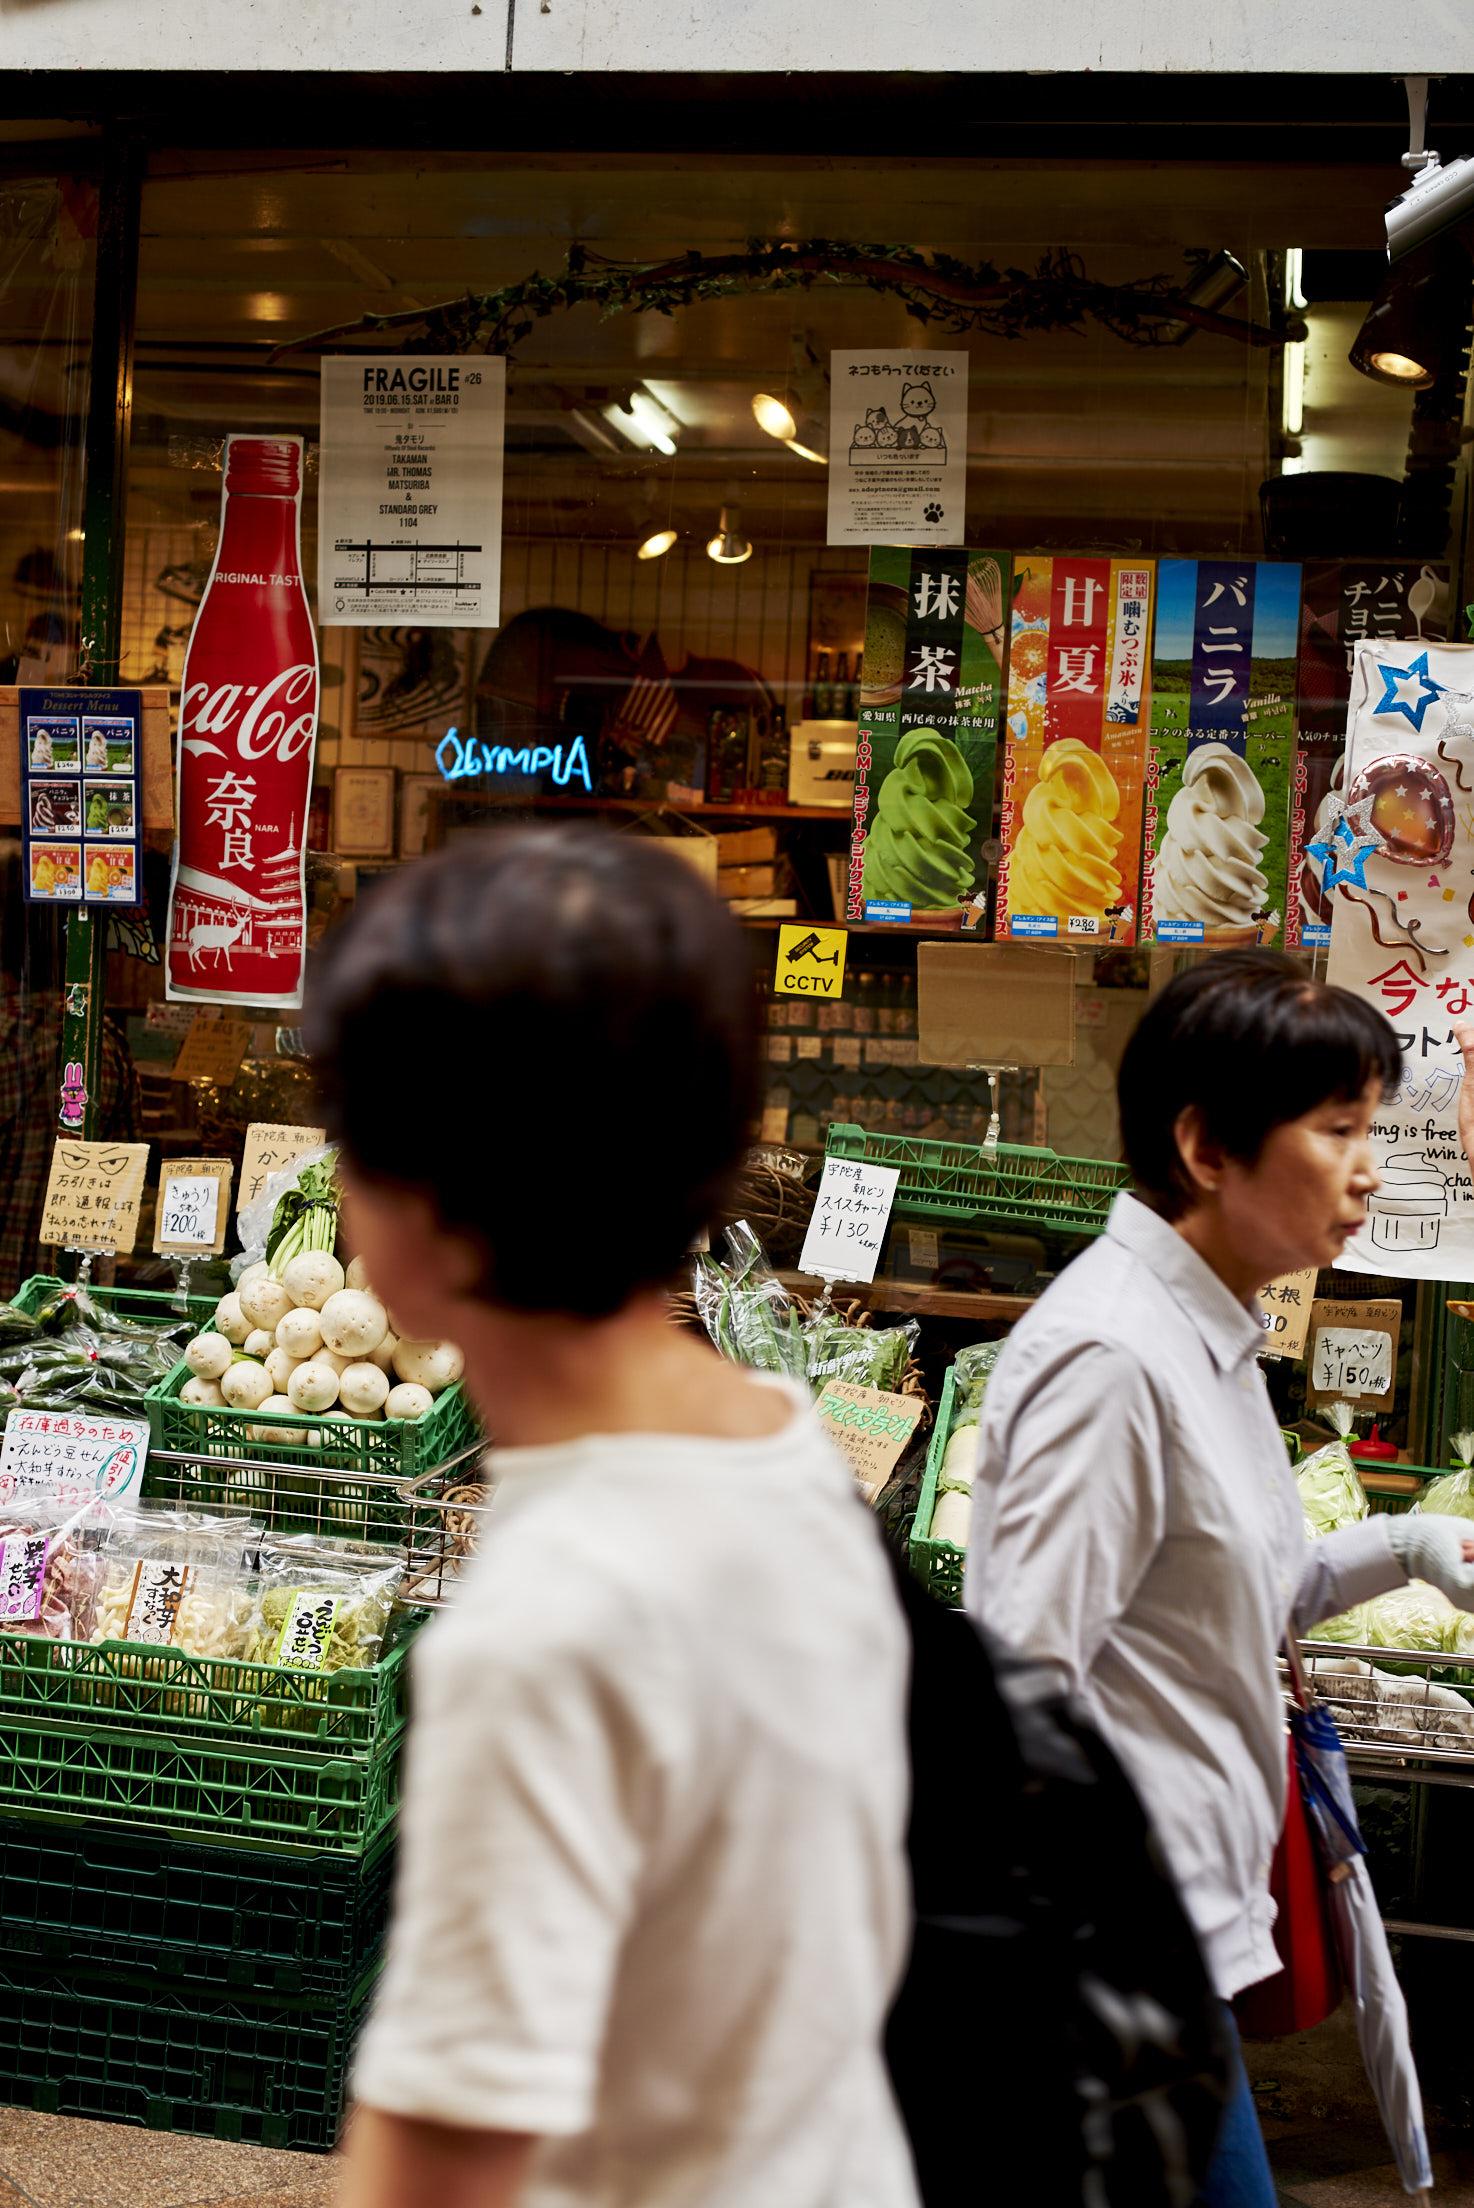 Yasara Gunawardena – Japan – Nara – Grocery Store